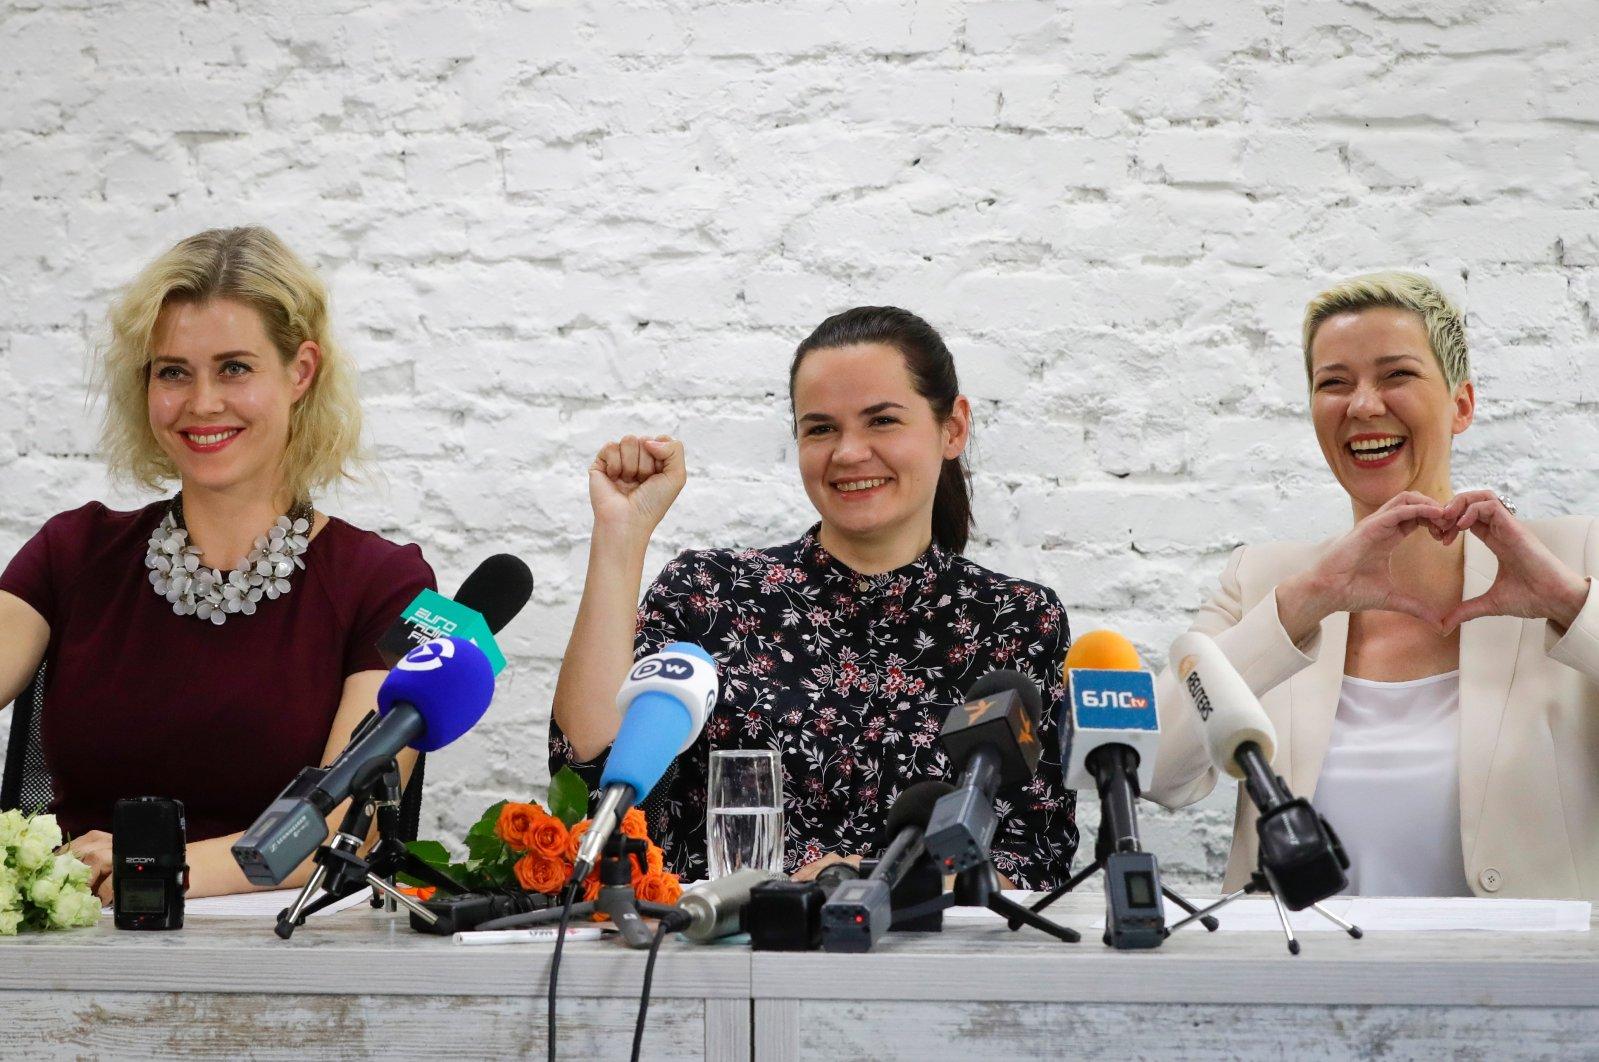 Maria Kolesnikova, a representative of Viktor Babariko (R), Svetlana Tikhanovskaya, candidate for the presidential elections (C), and wife of non-registered candidate Valery Tsepkalo, Veronika Tsepkalo, gestures during a news conference in Minsk, Belarus, July 17, 2020. (AP Photo)